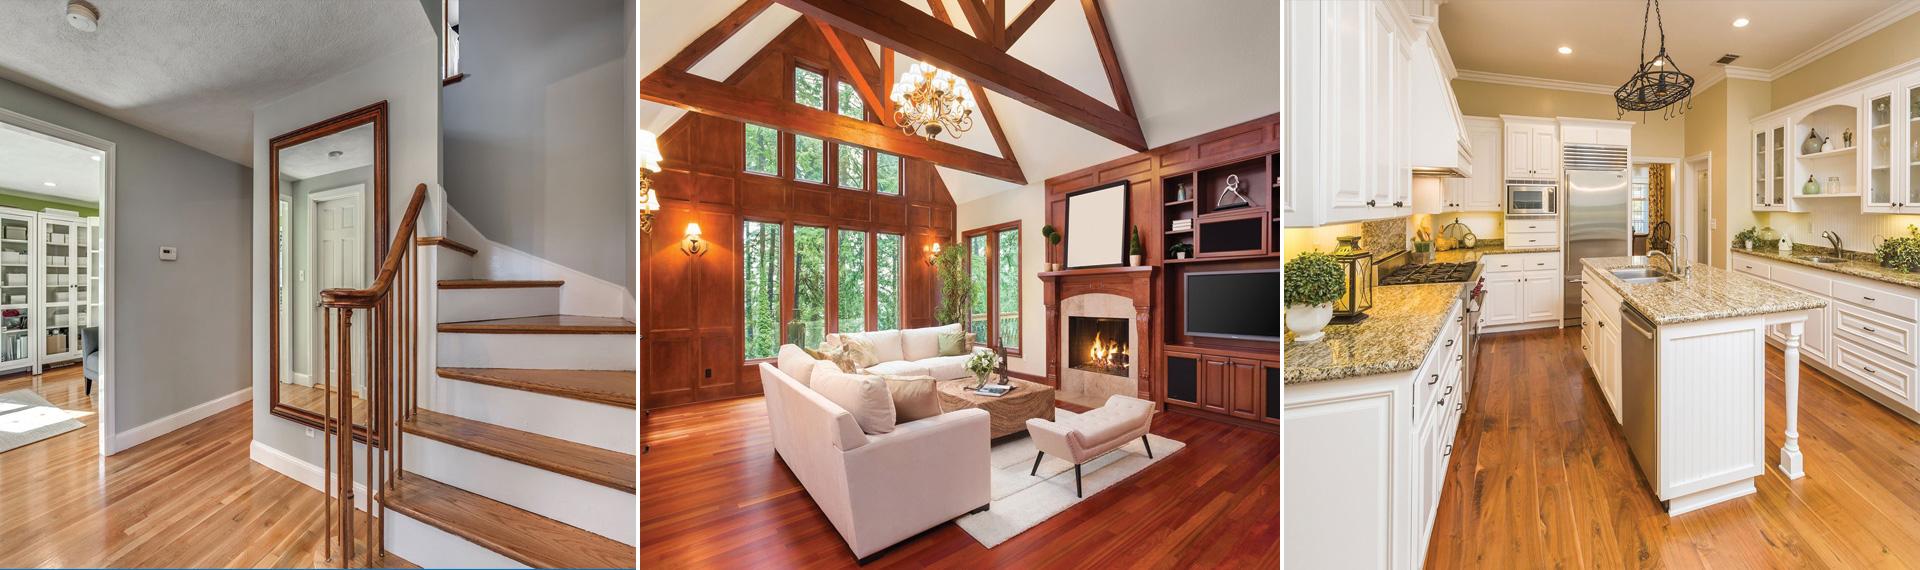 Renew Flooring & Home Improvement LLC Mayfield Heights OH